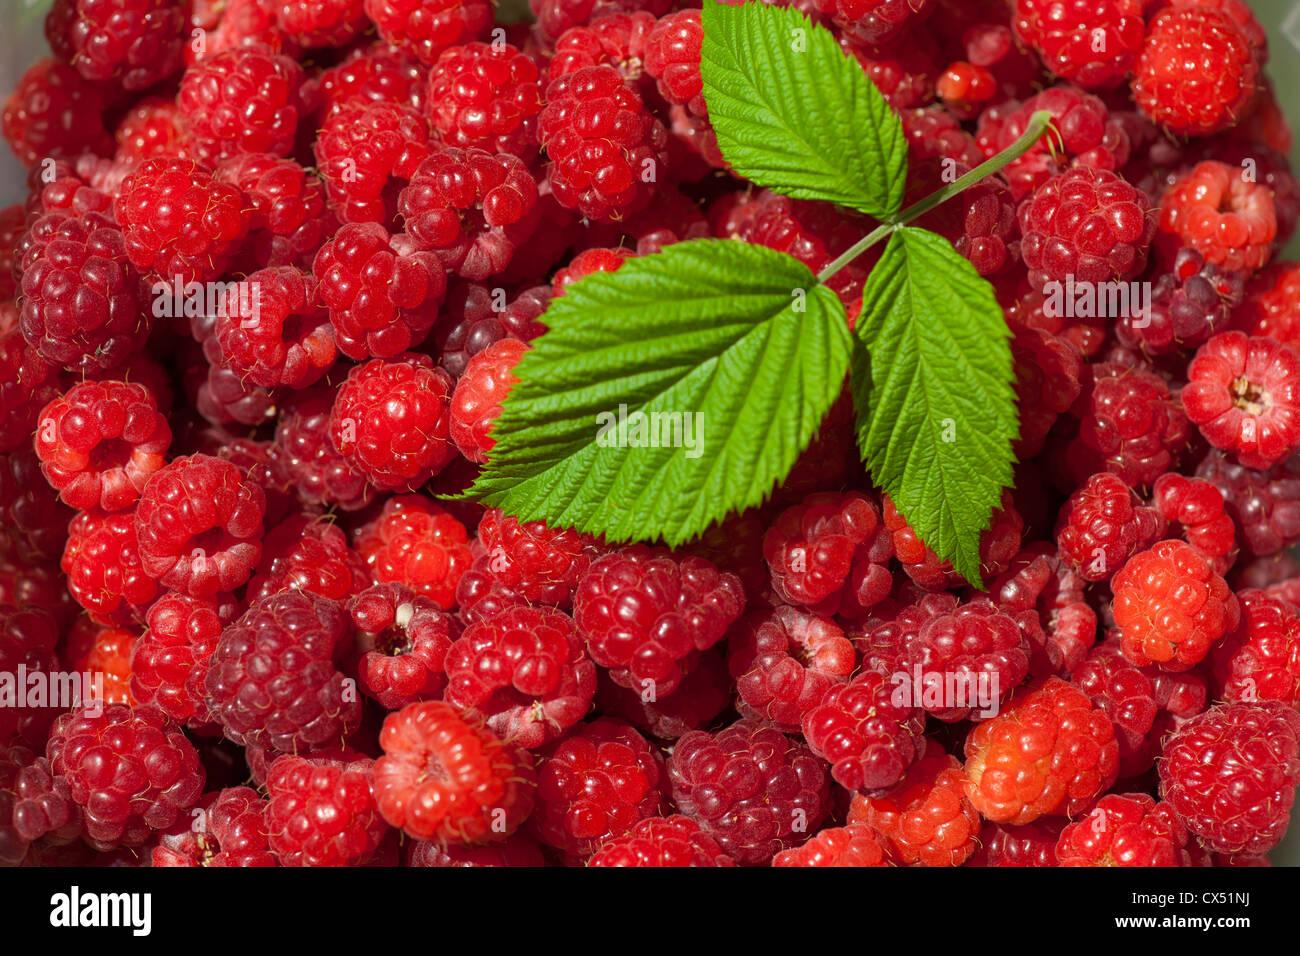 Rote Frucht Himbeere Hintergrund, Makroaufnahme Stockbild